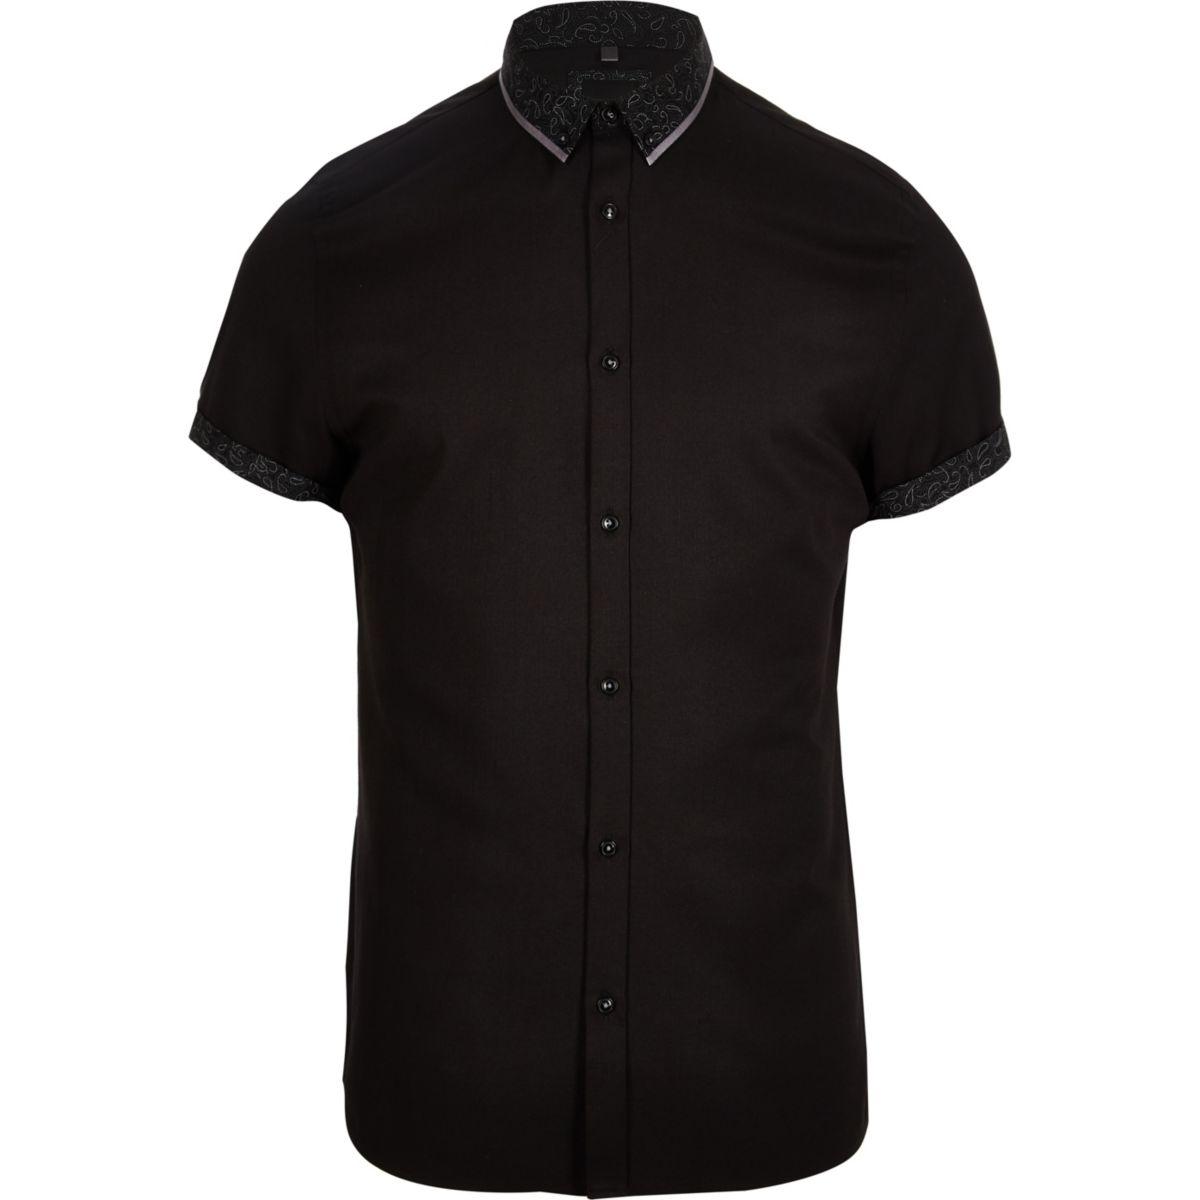 Black double collar slim fit shirt